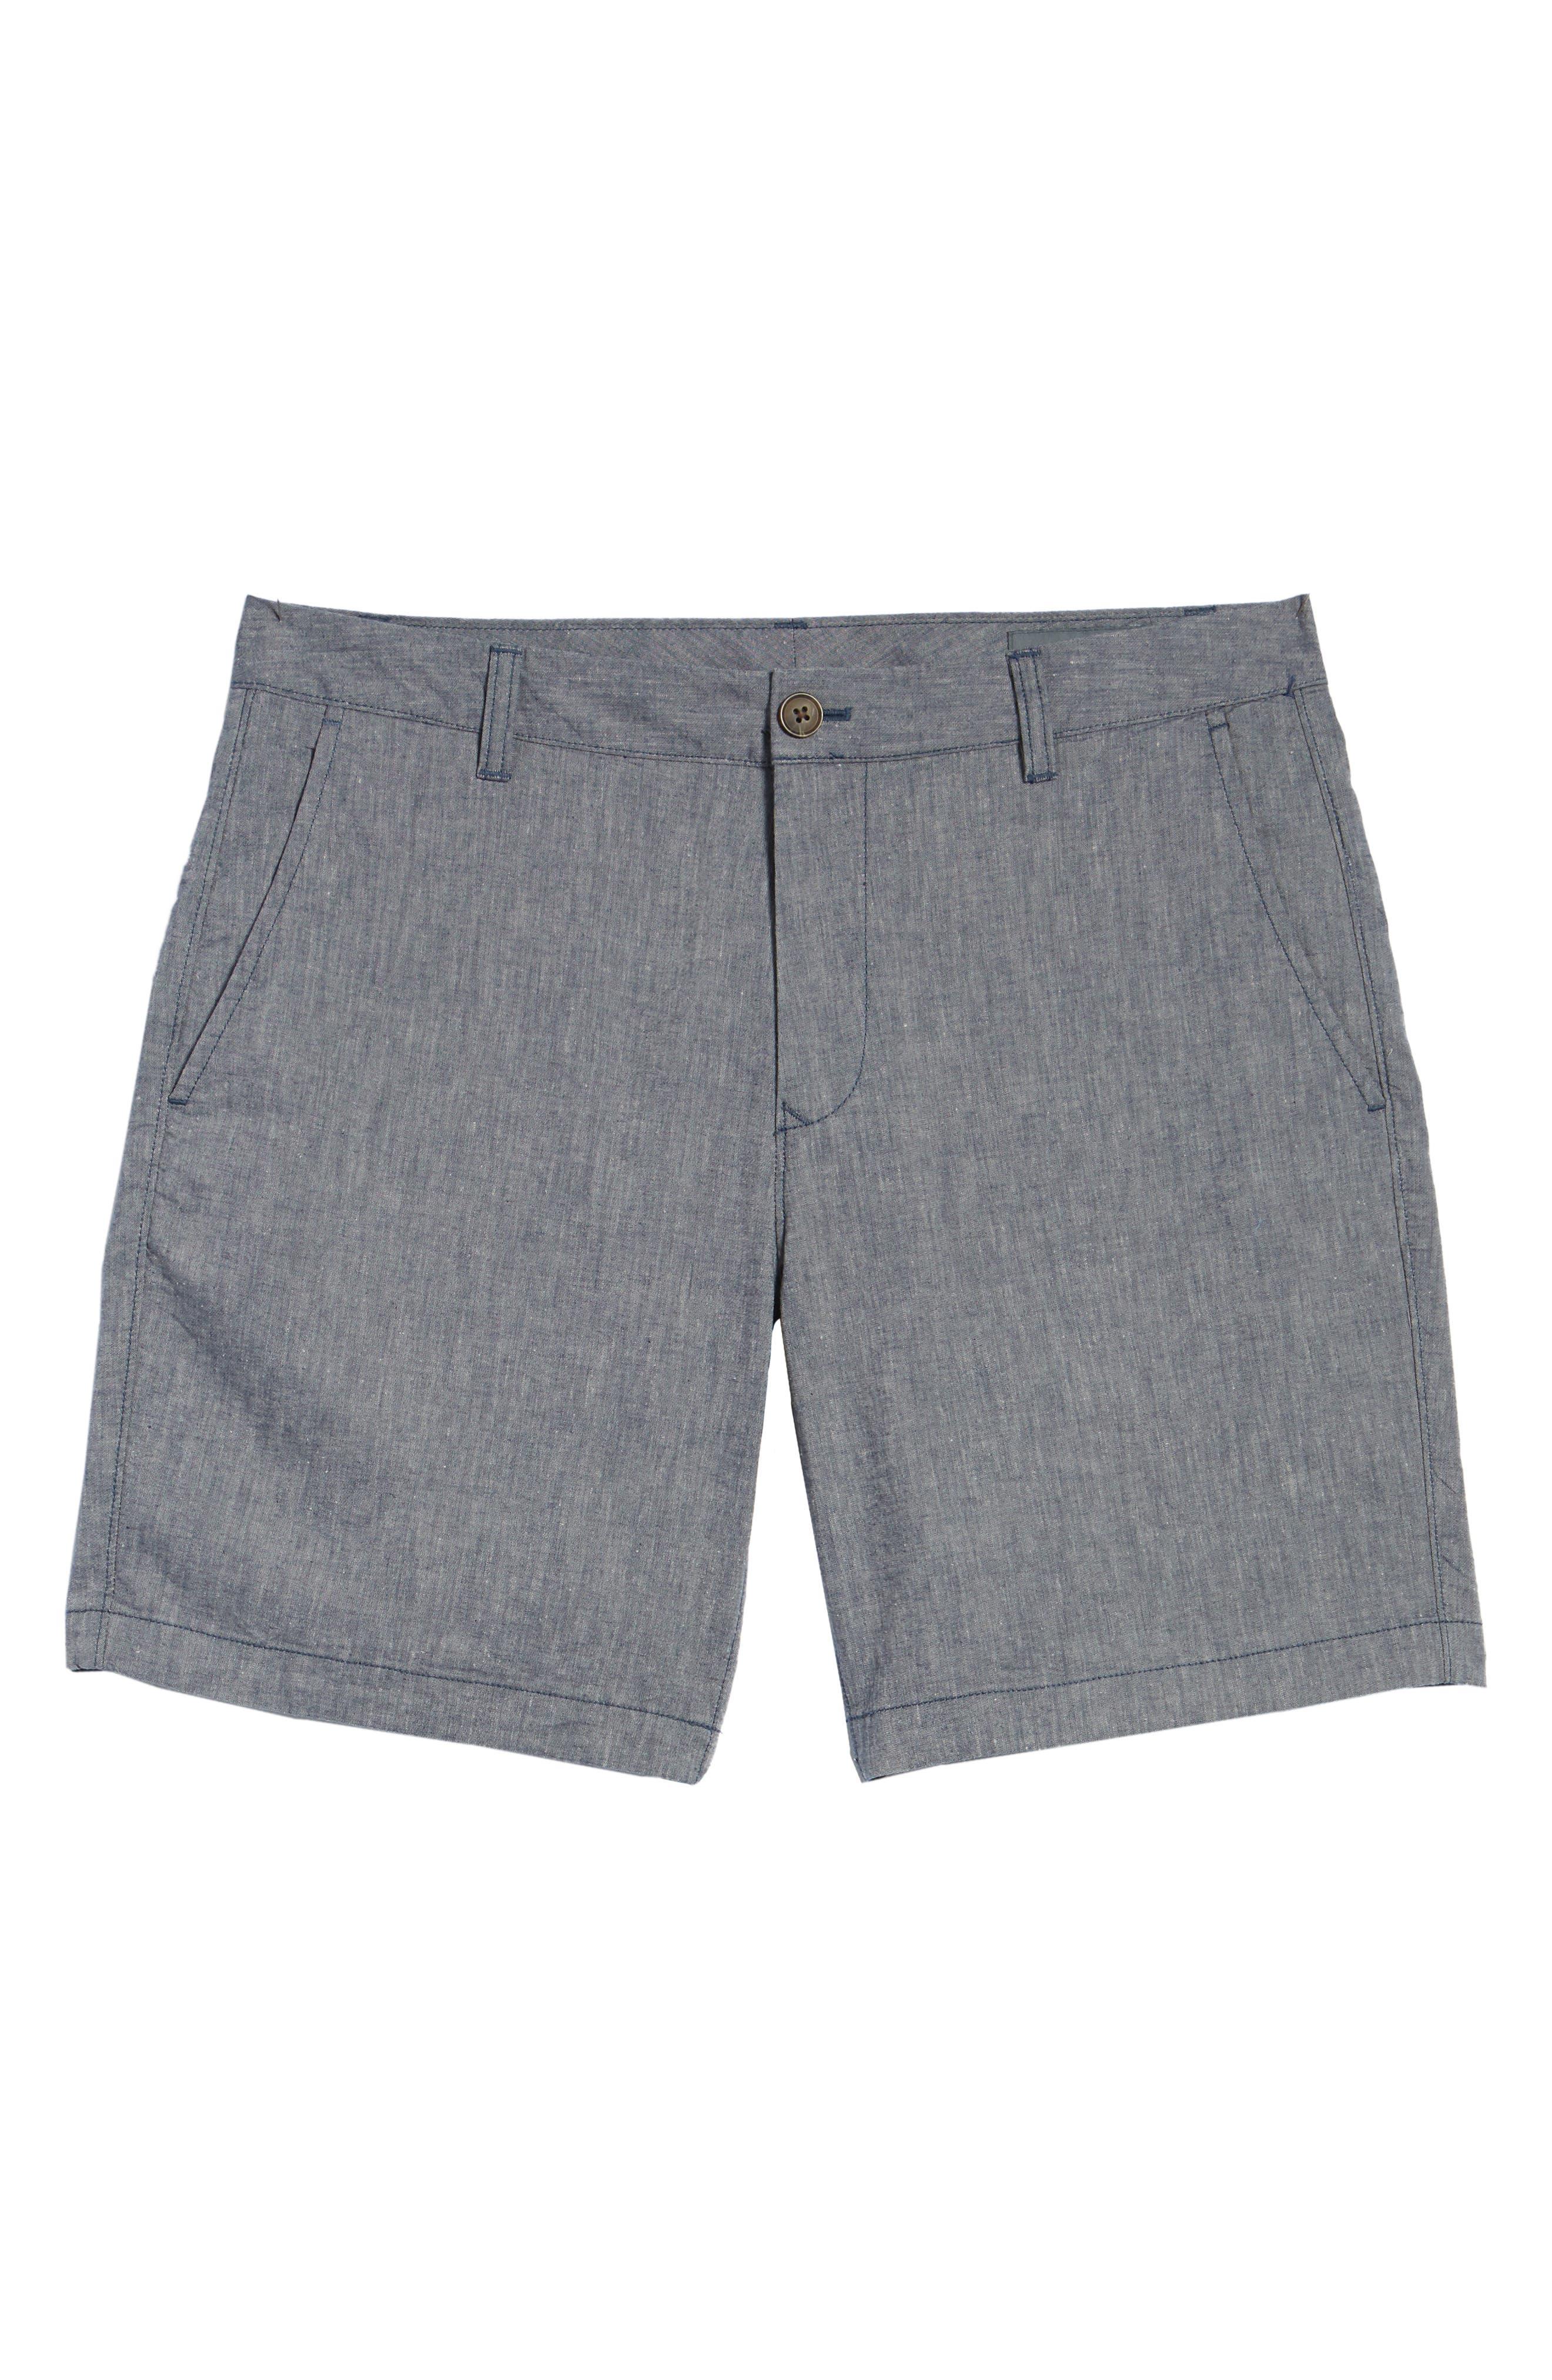 Novelty Chino Shorts,                             Alternate thumbnail 6, color,